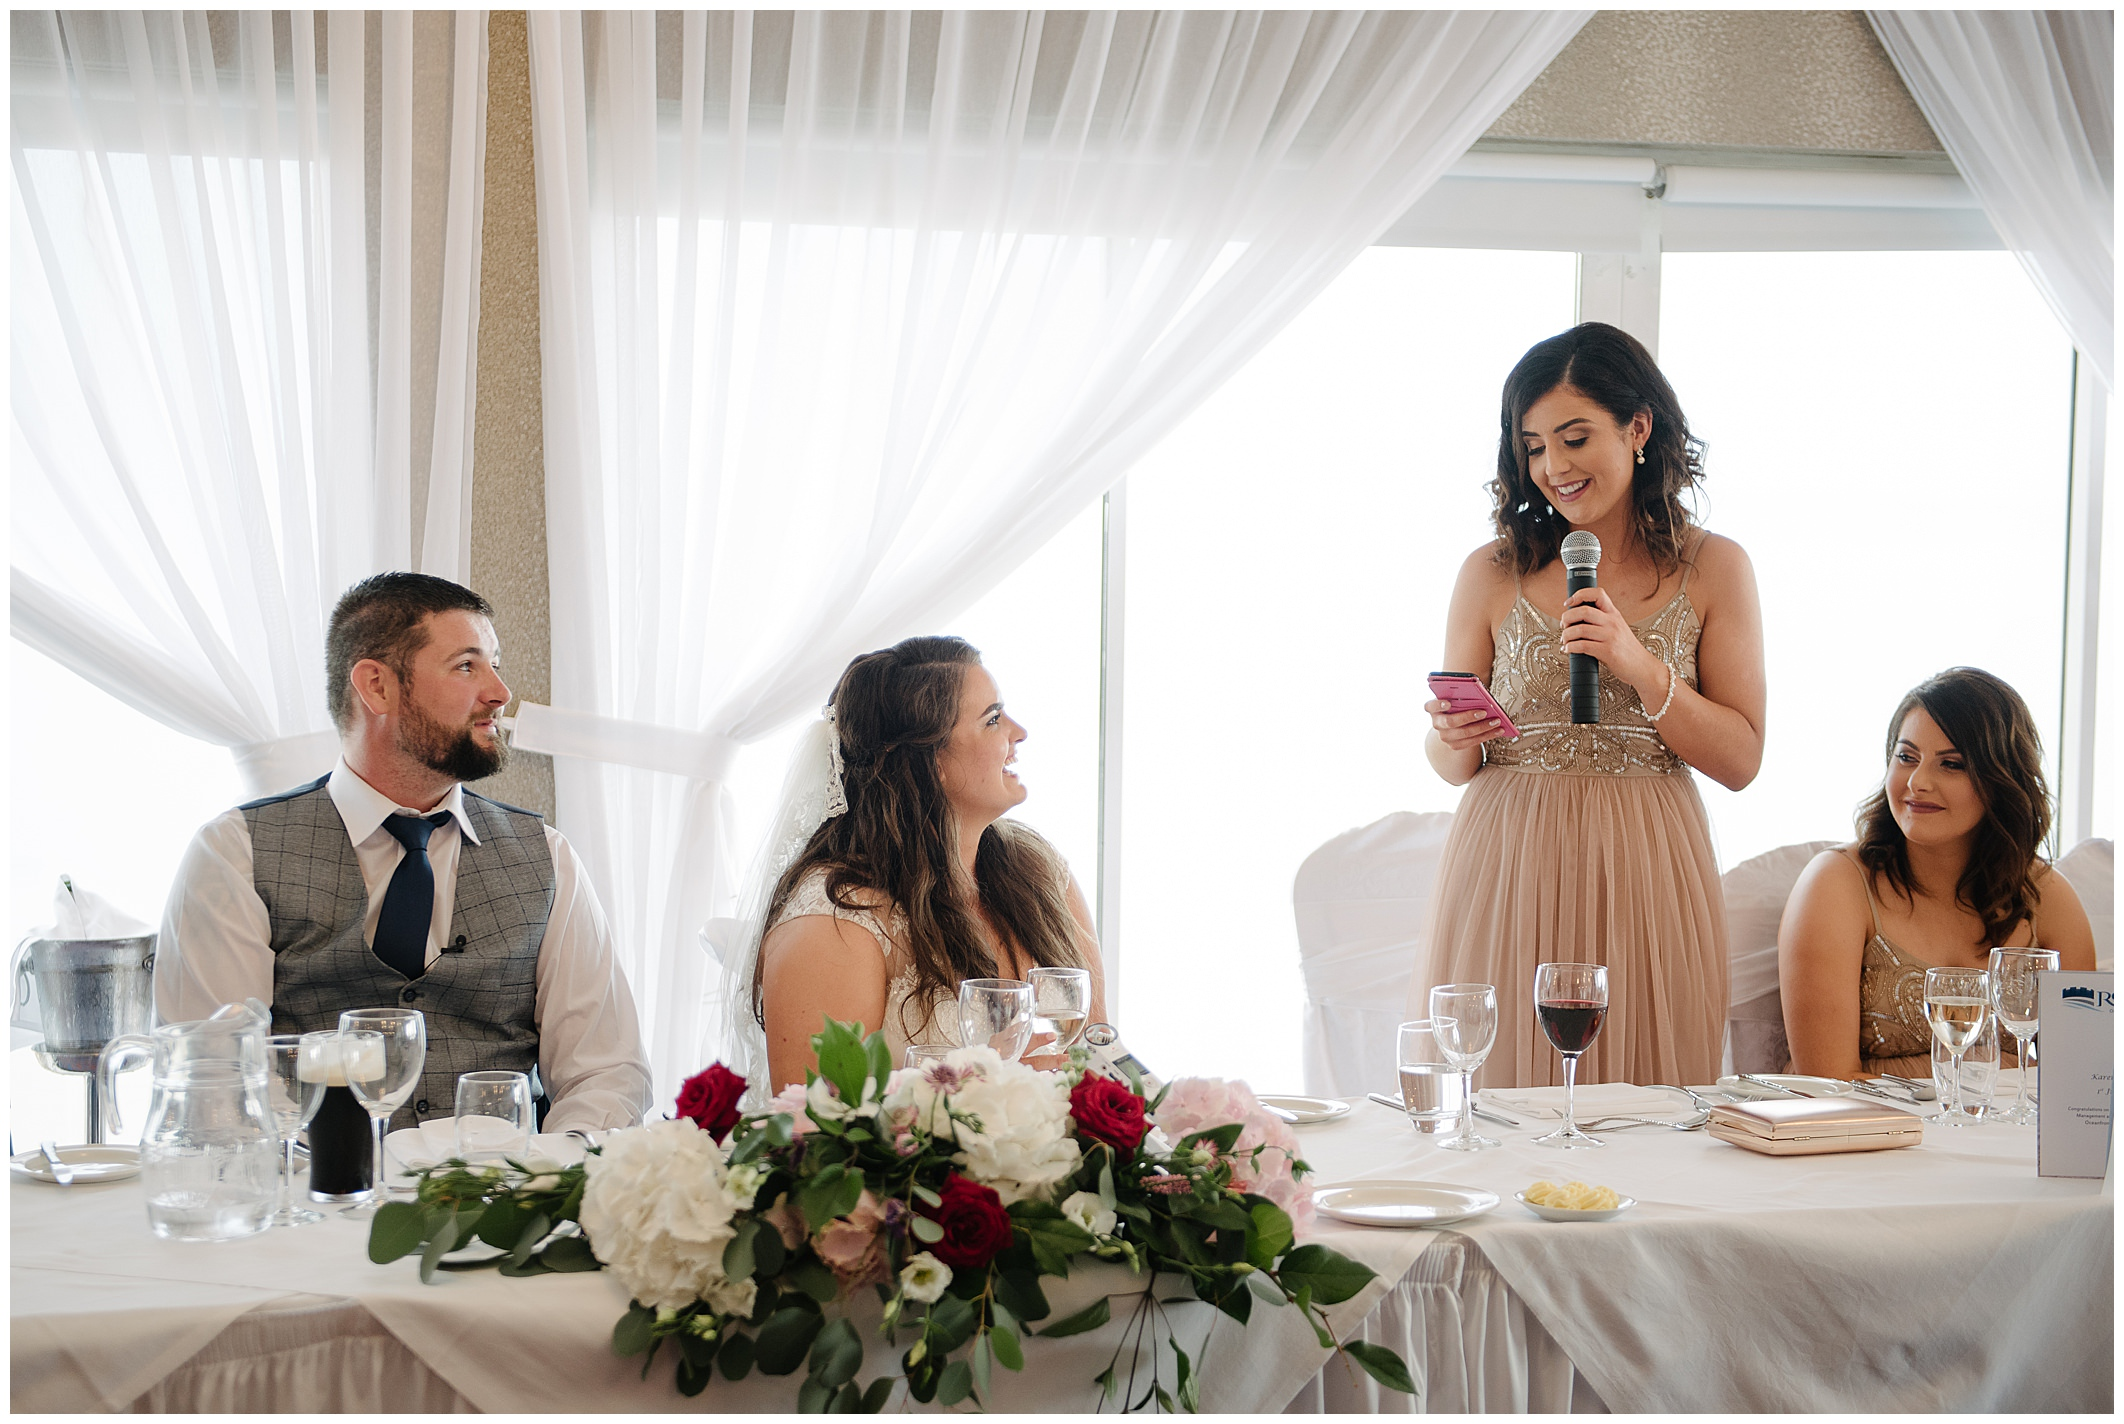 redcastle-hotel-wedding-karen-brian-jude-browne-photography-118.jpg